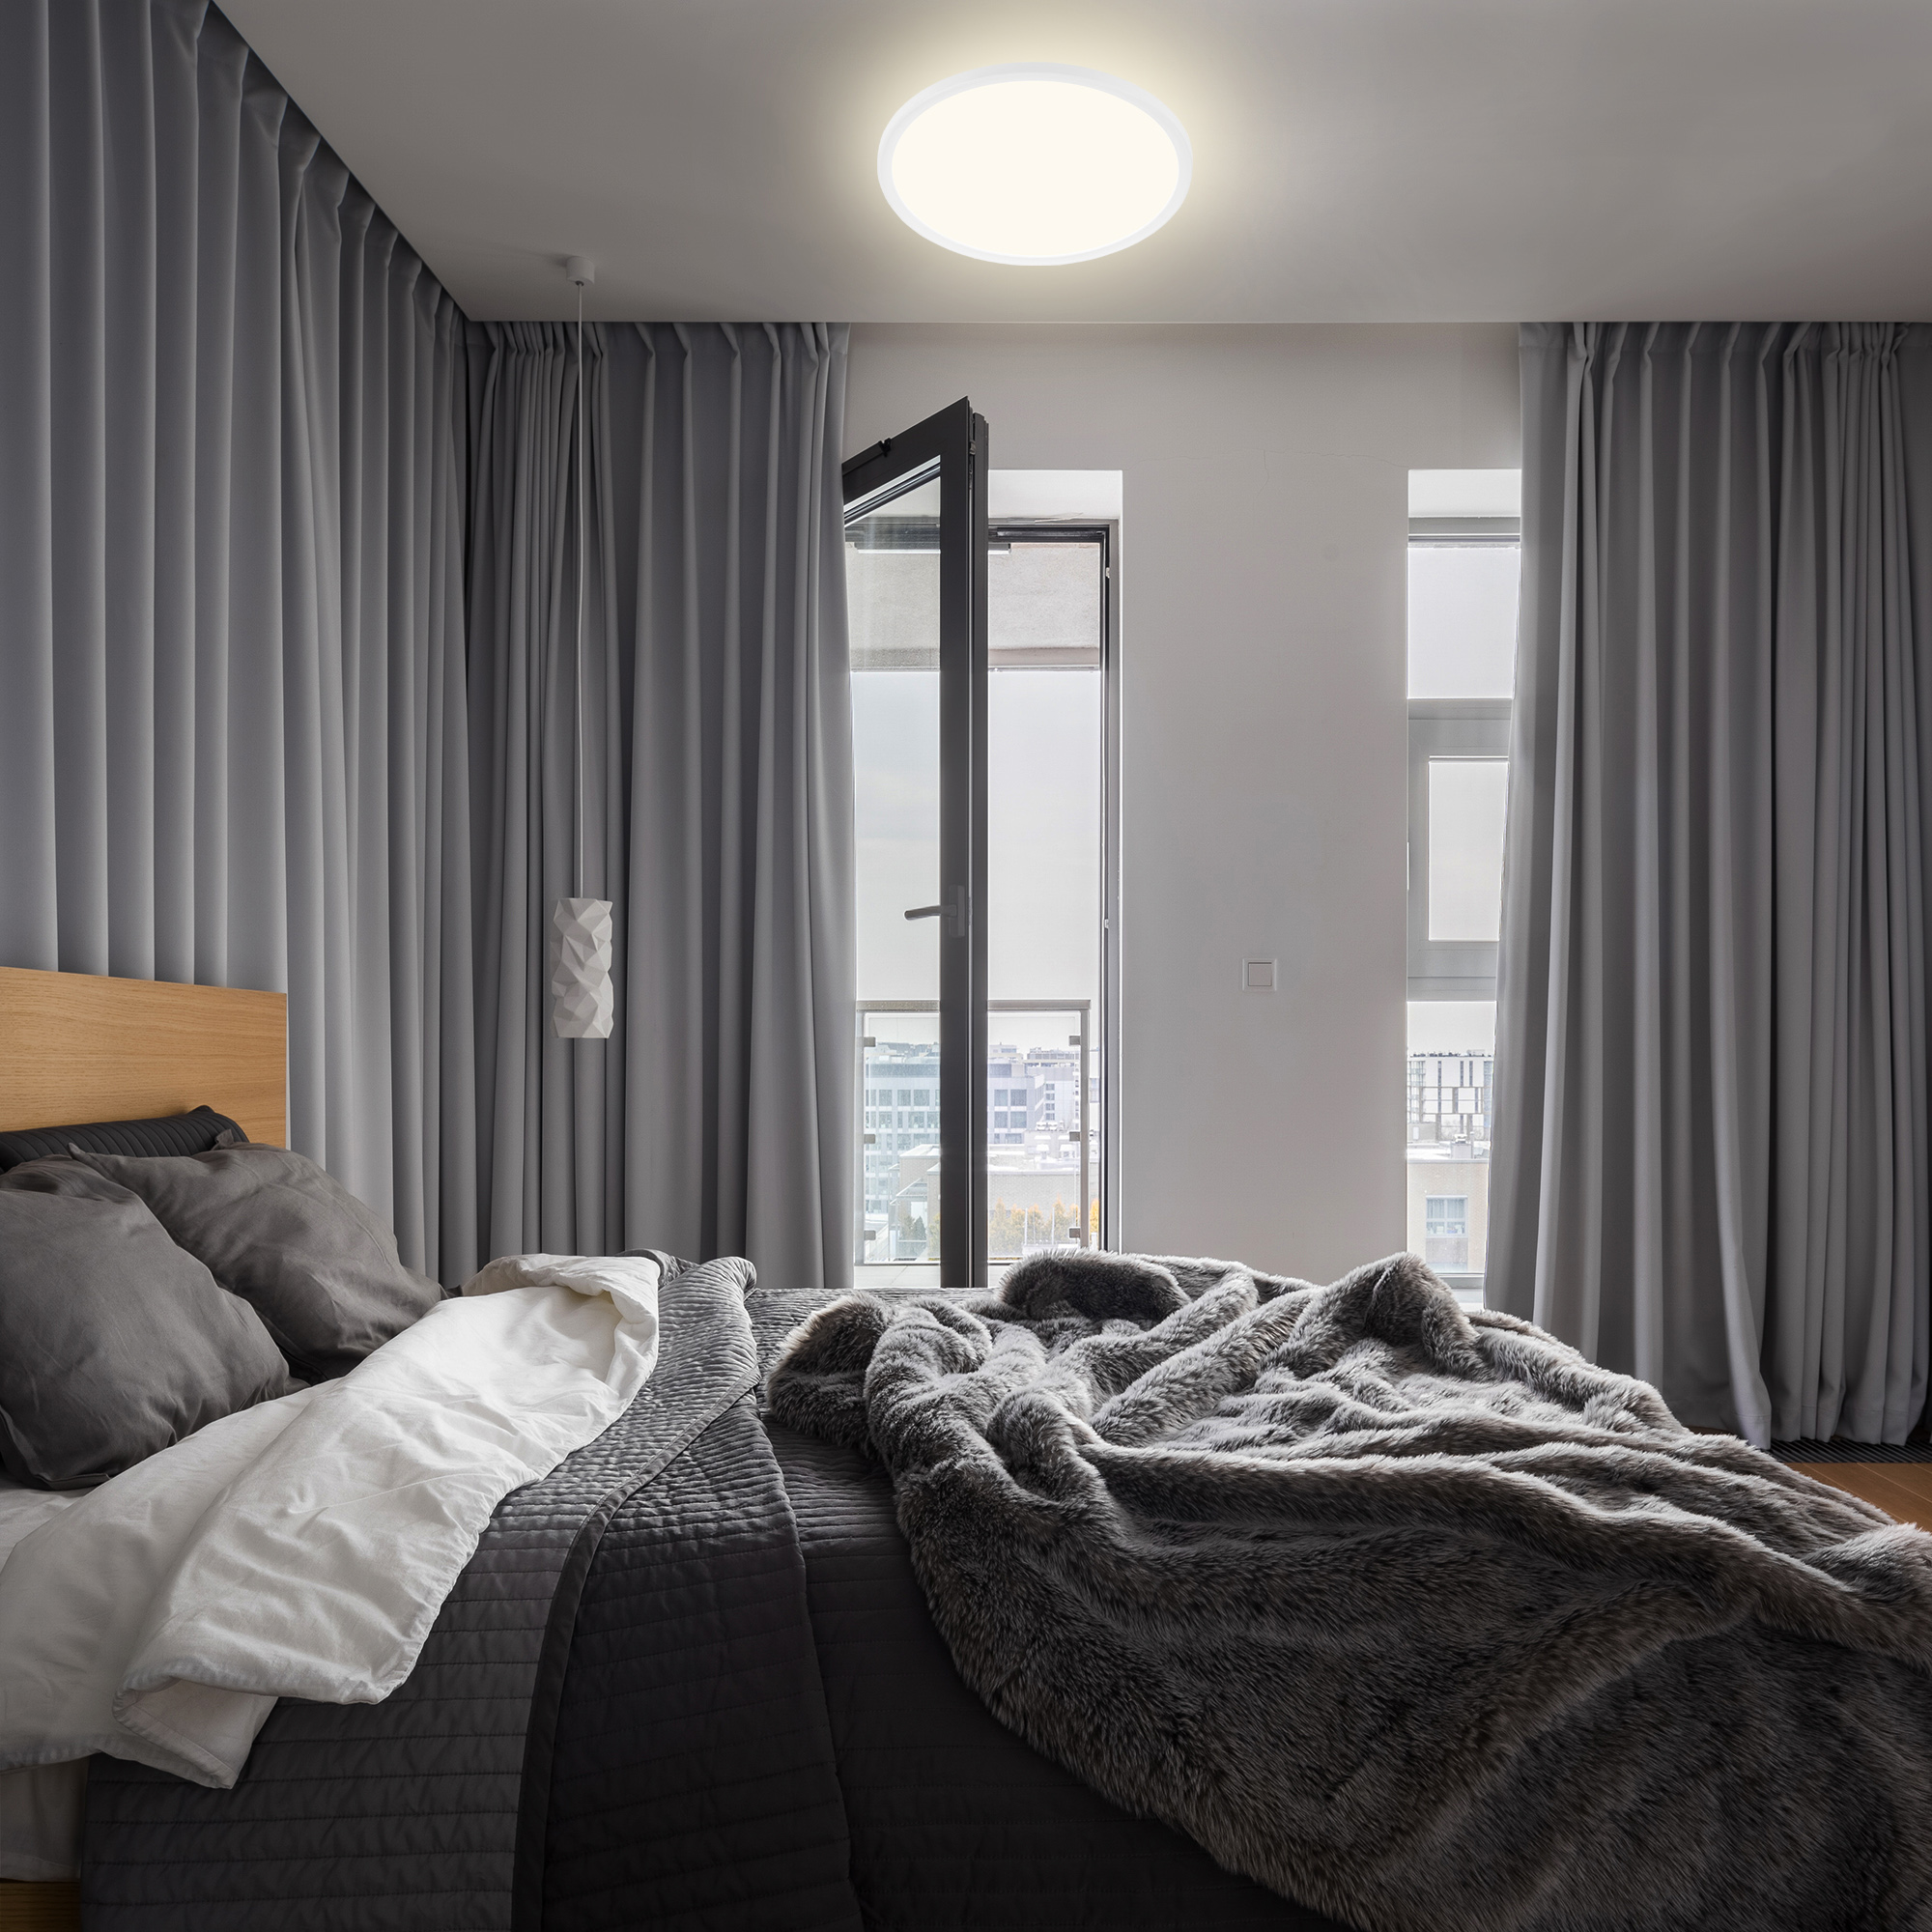 SLIM LED Panel, Ø 29,3cm, 2400 LUMEN, 18 WATT, Weiß